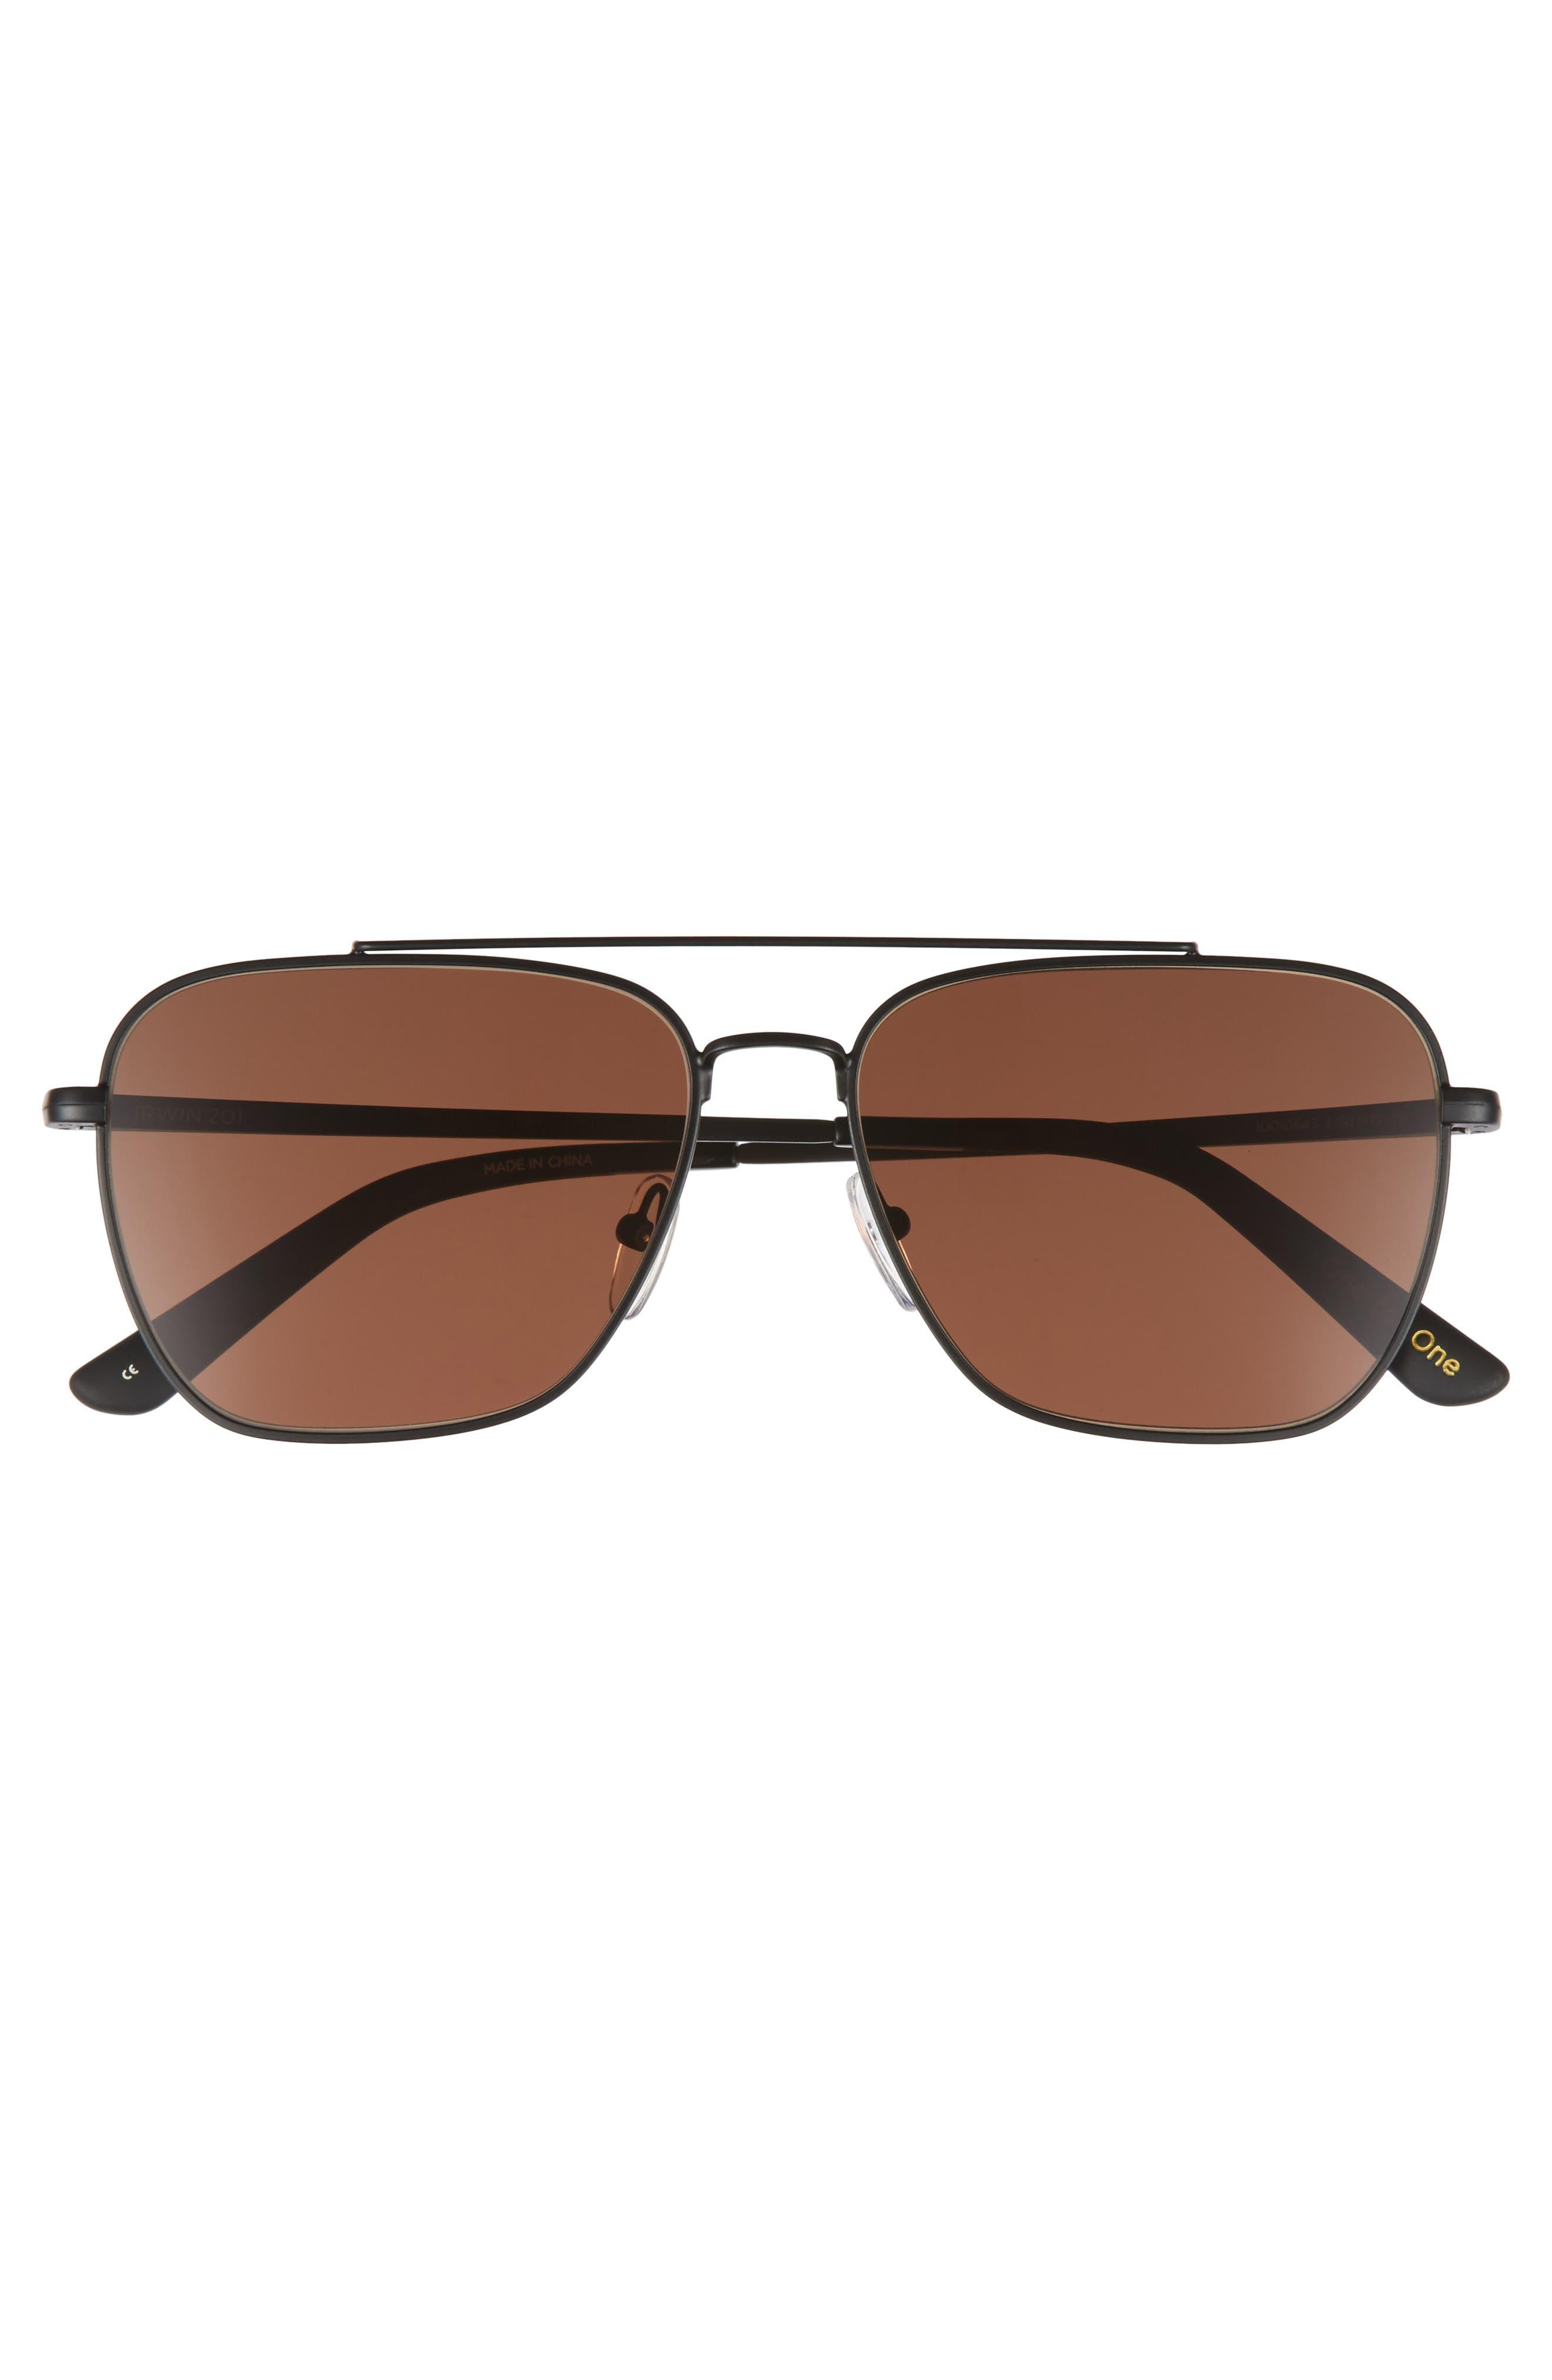 Irwin 58mm Sunglasses,                             Alternate thumbnail 2, color,                             Matte Black